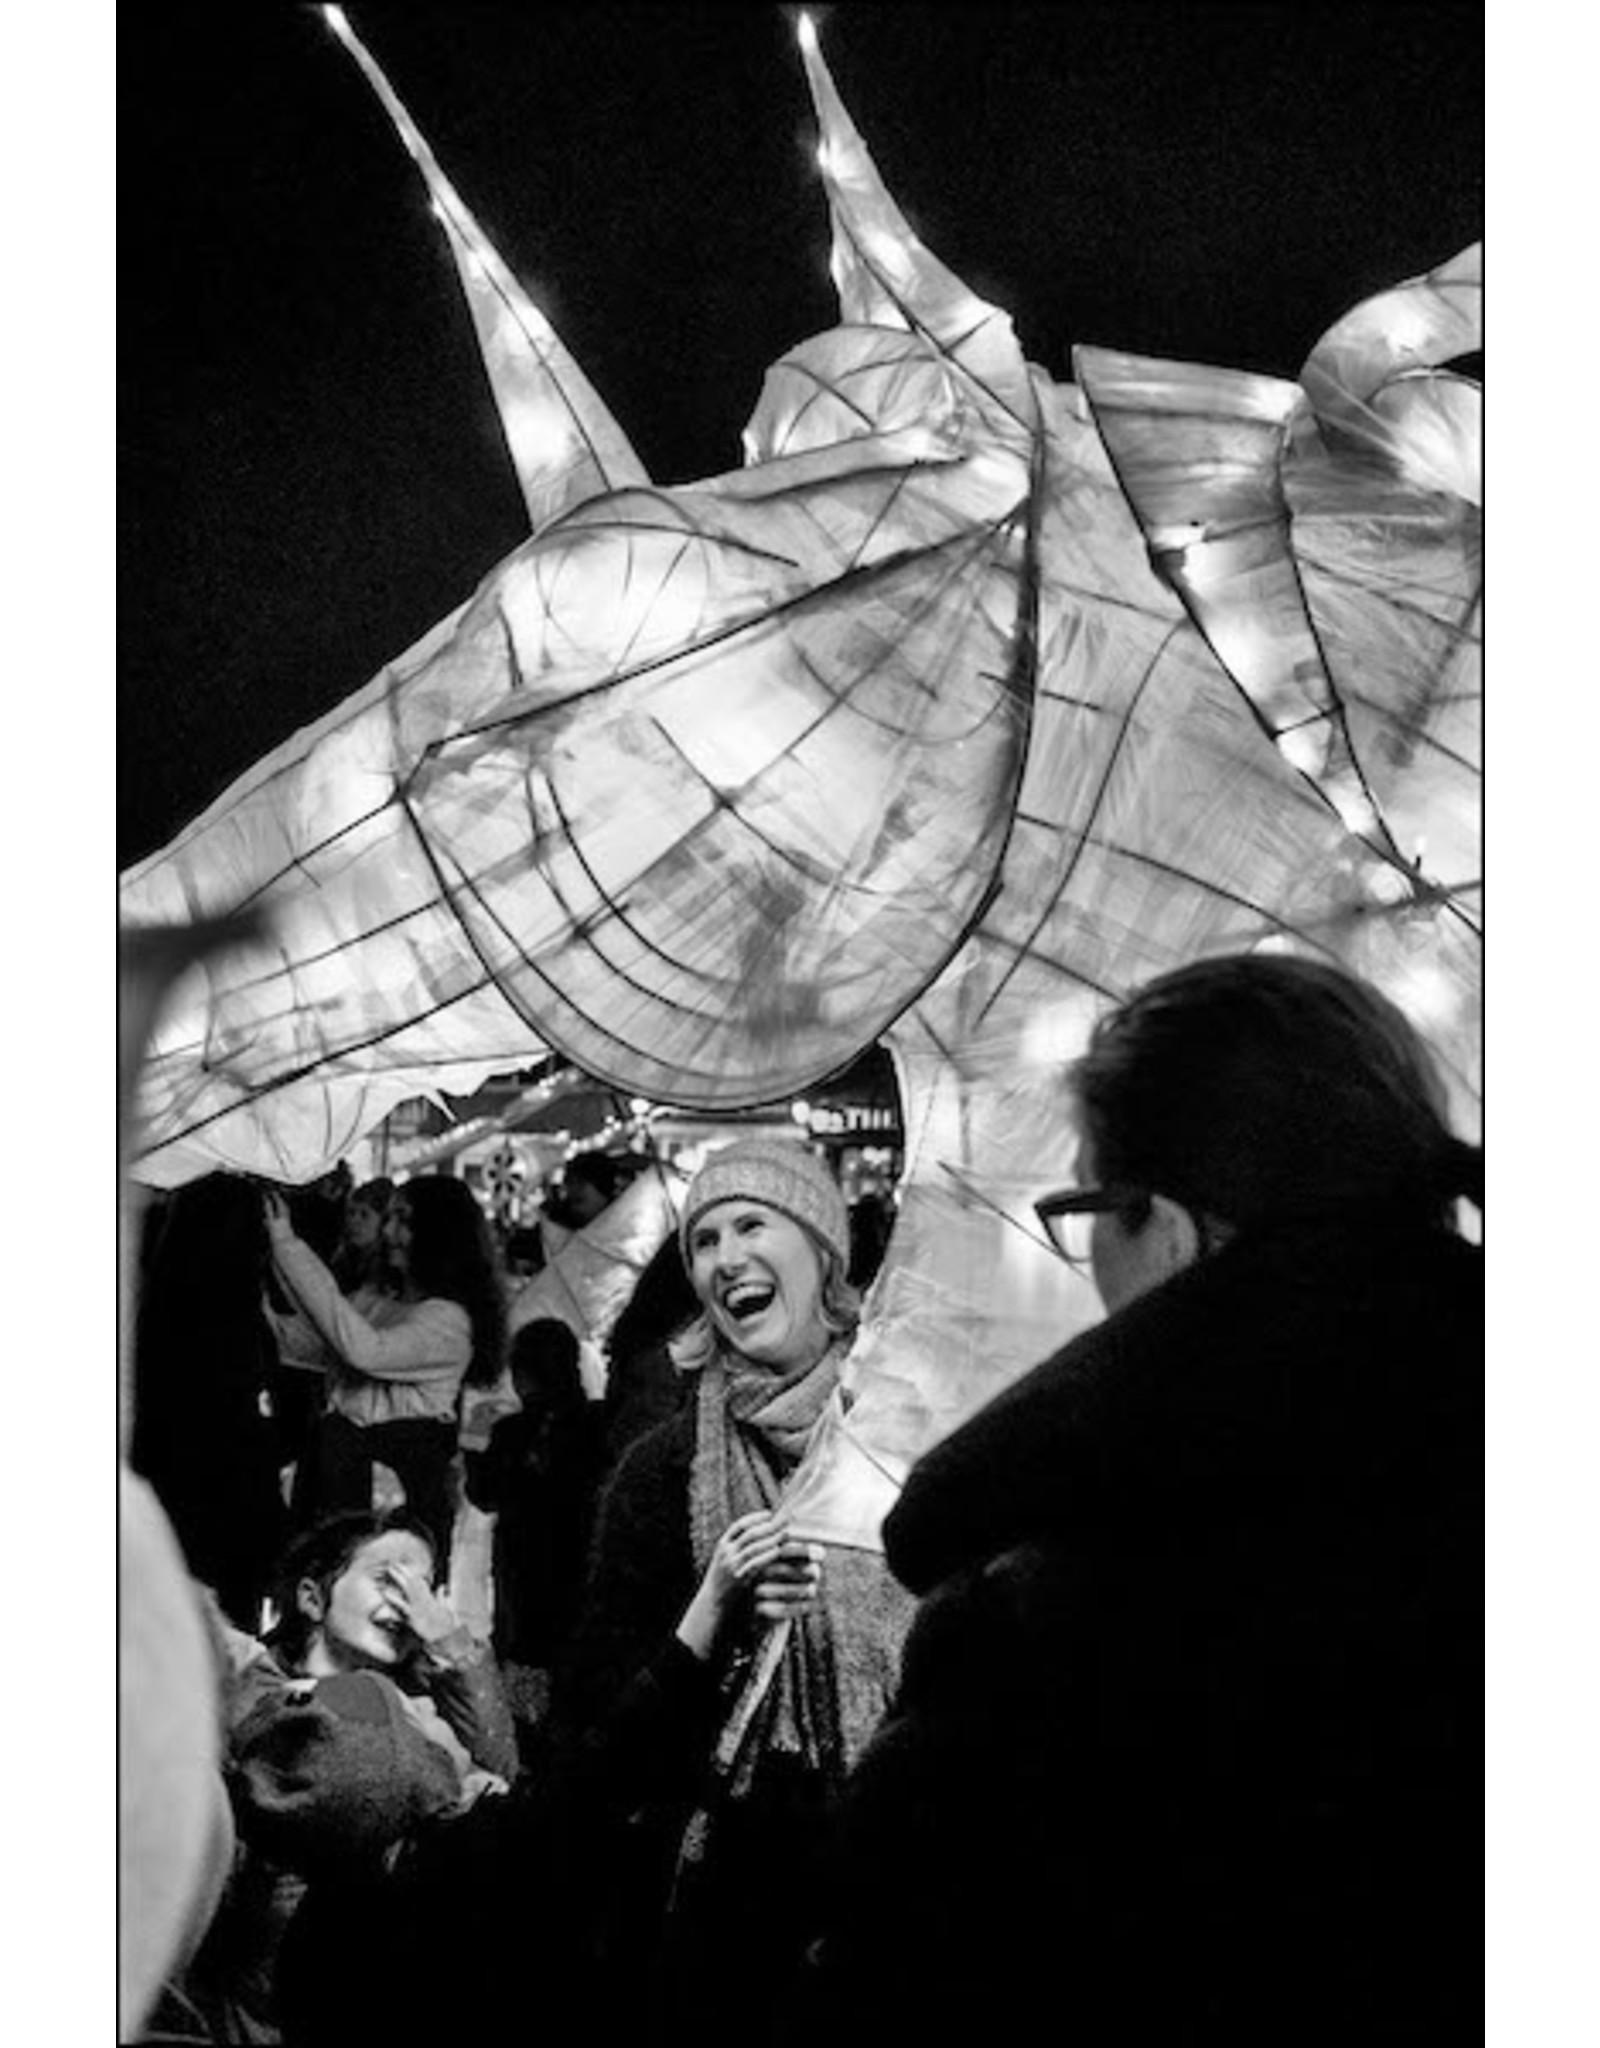 Ian Berry People at the Christmas Lantern Parade, Salisbury, Wiltshire. Ian Berry (26)